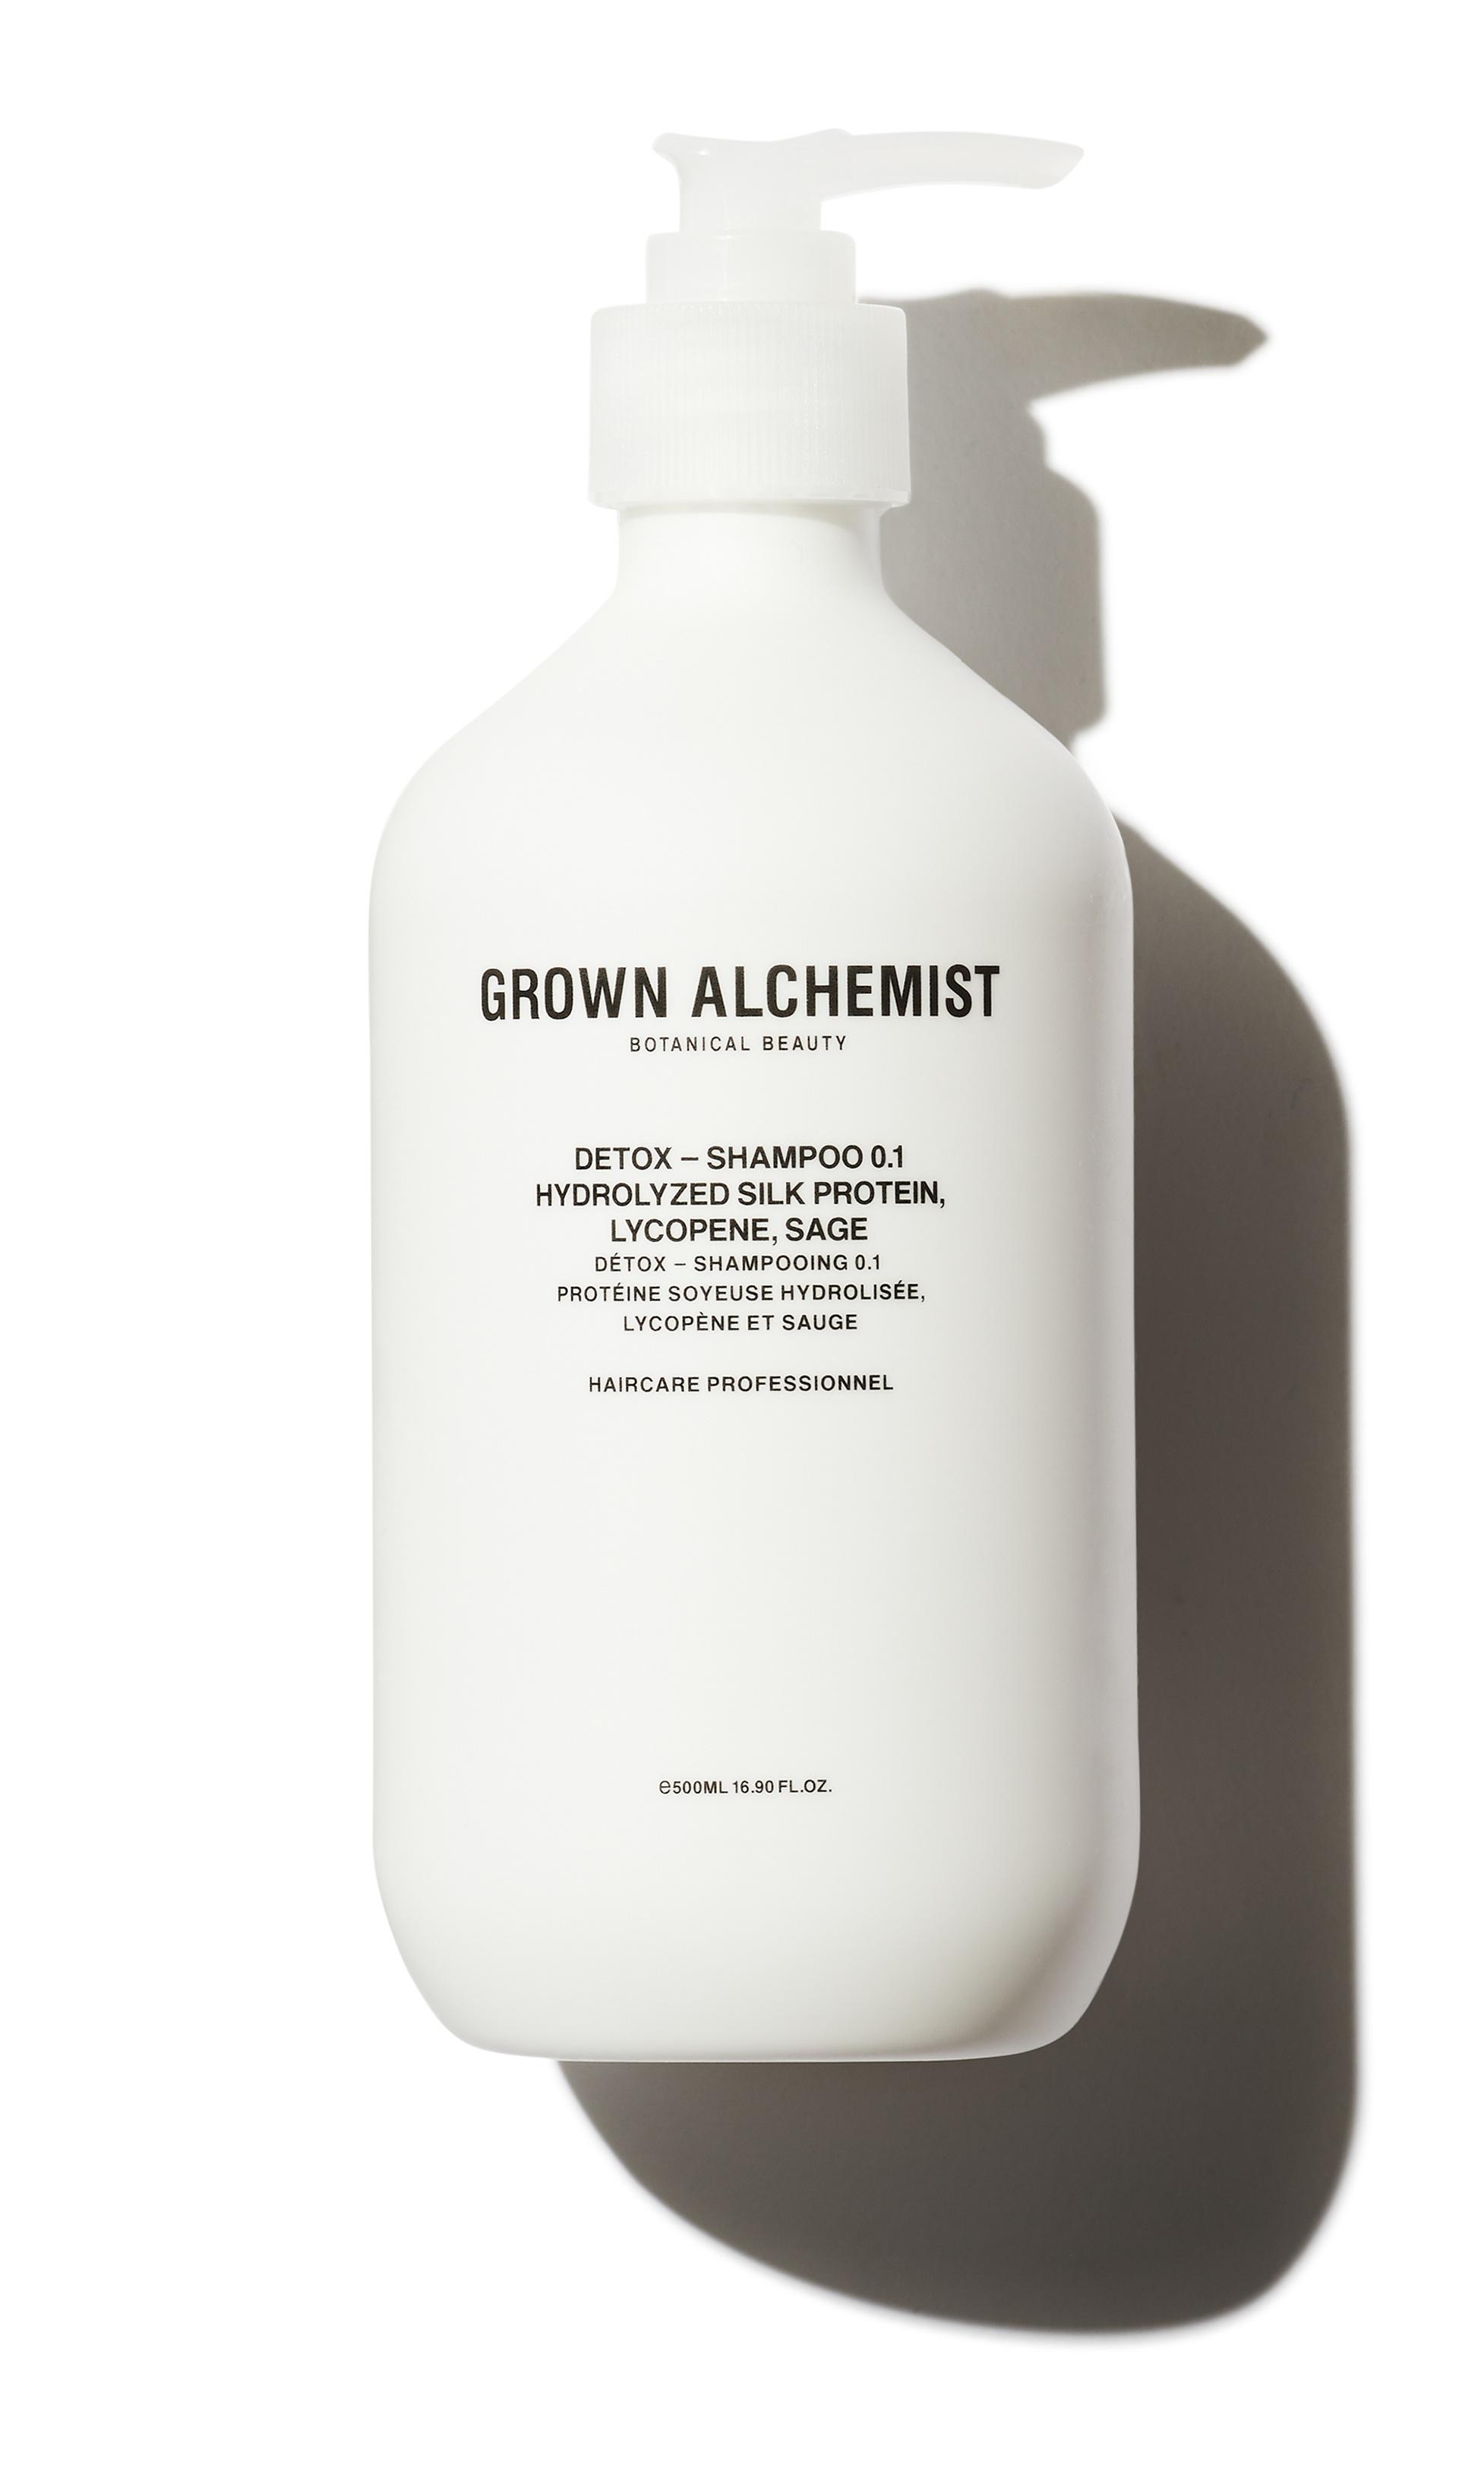 Grown Alchemist Detox - Shampoo 0.1